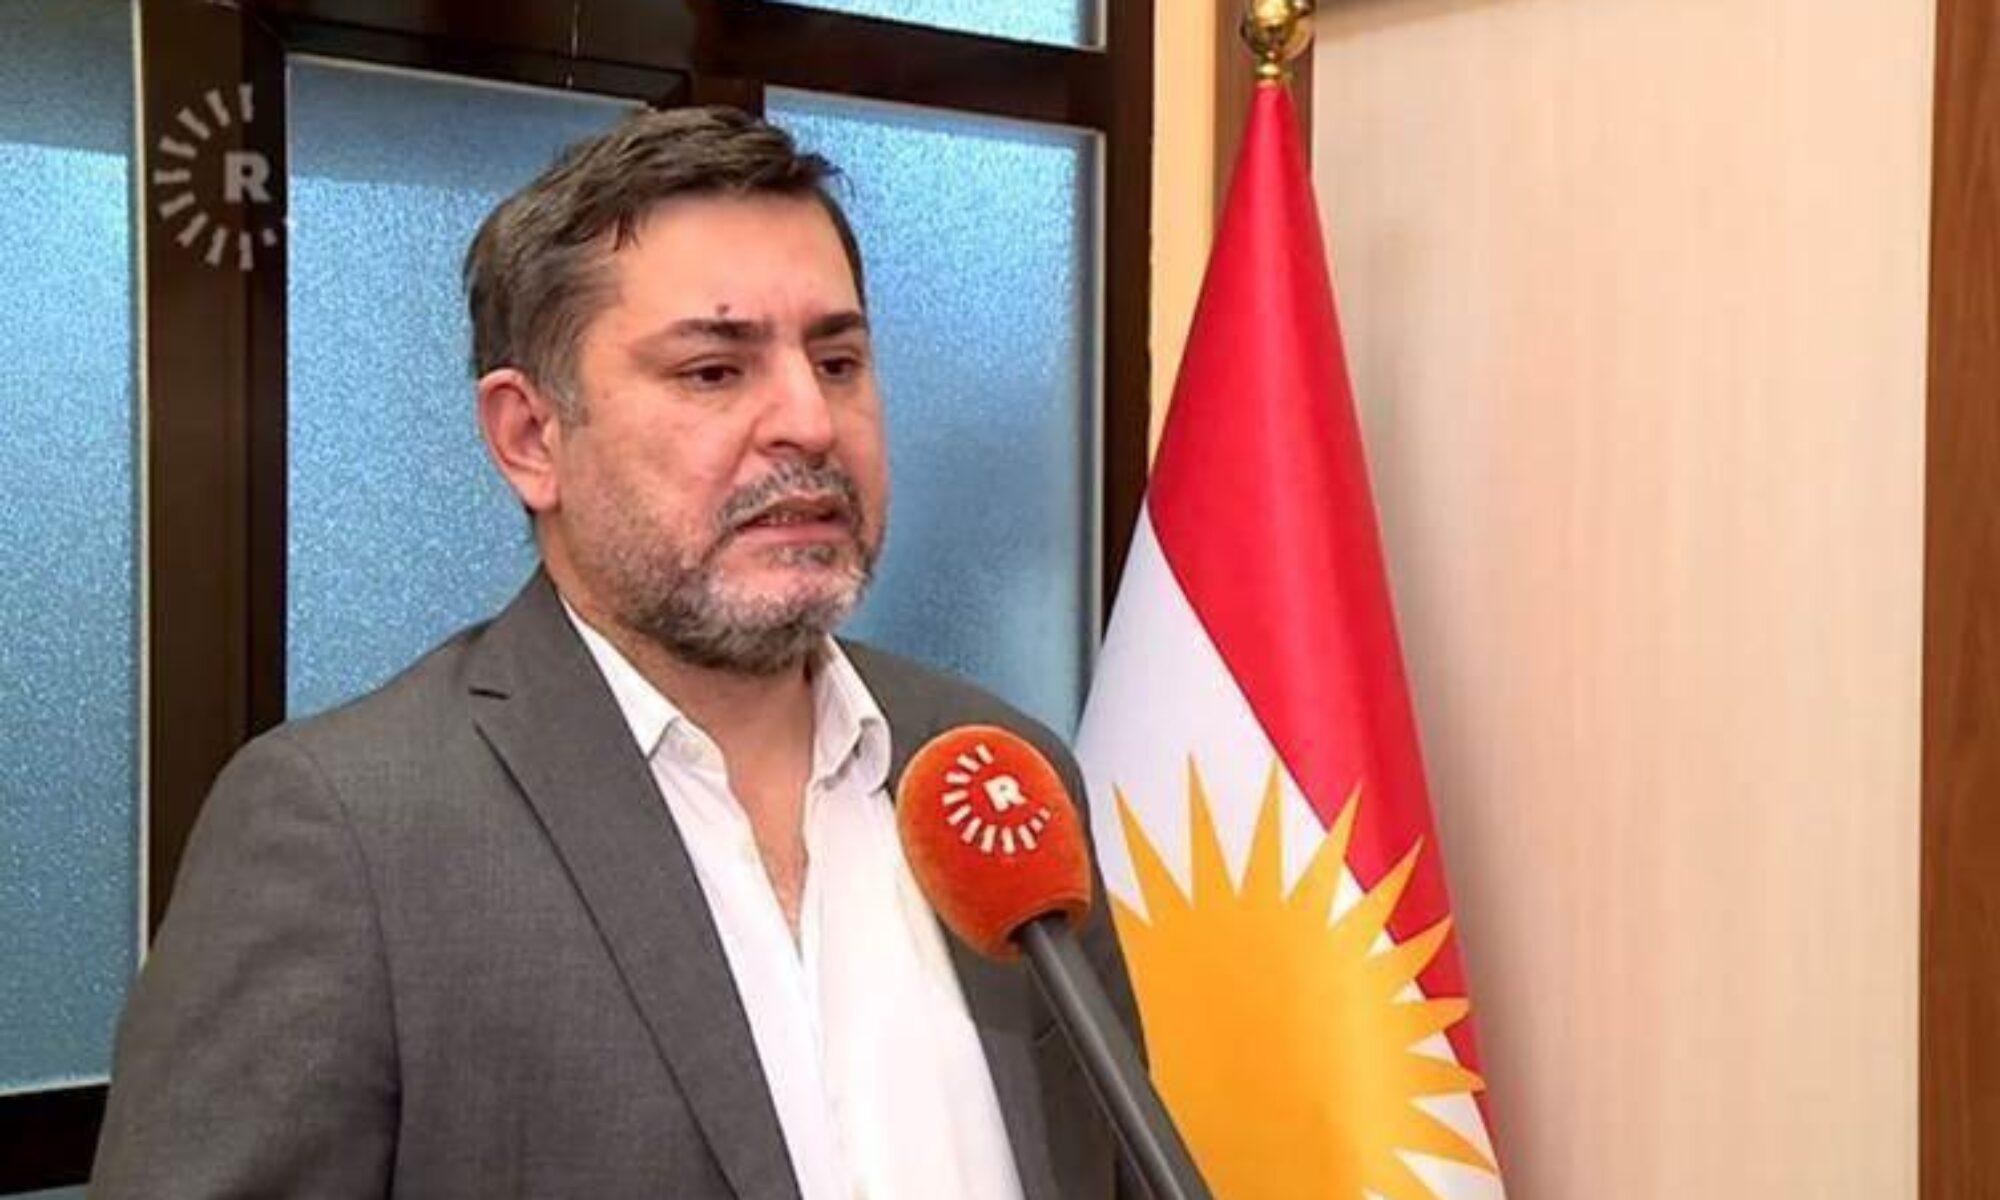 Kürt siyasetçi Hişyar Özalp gözaltına alındı